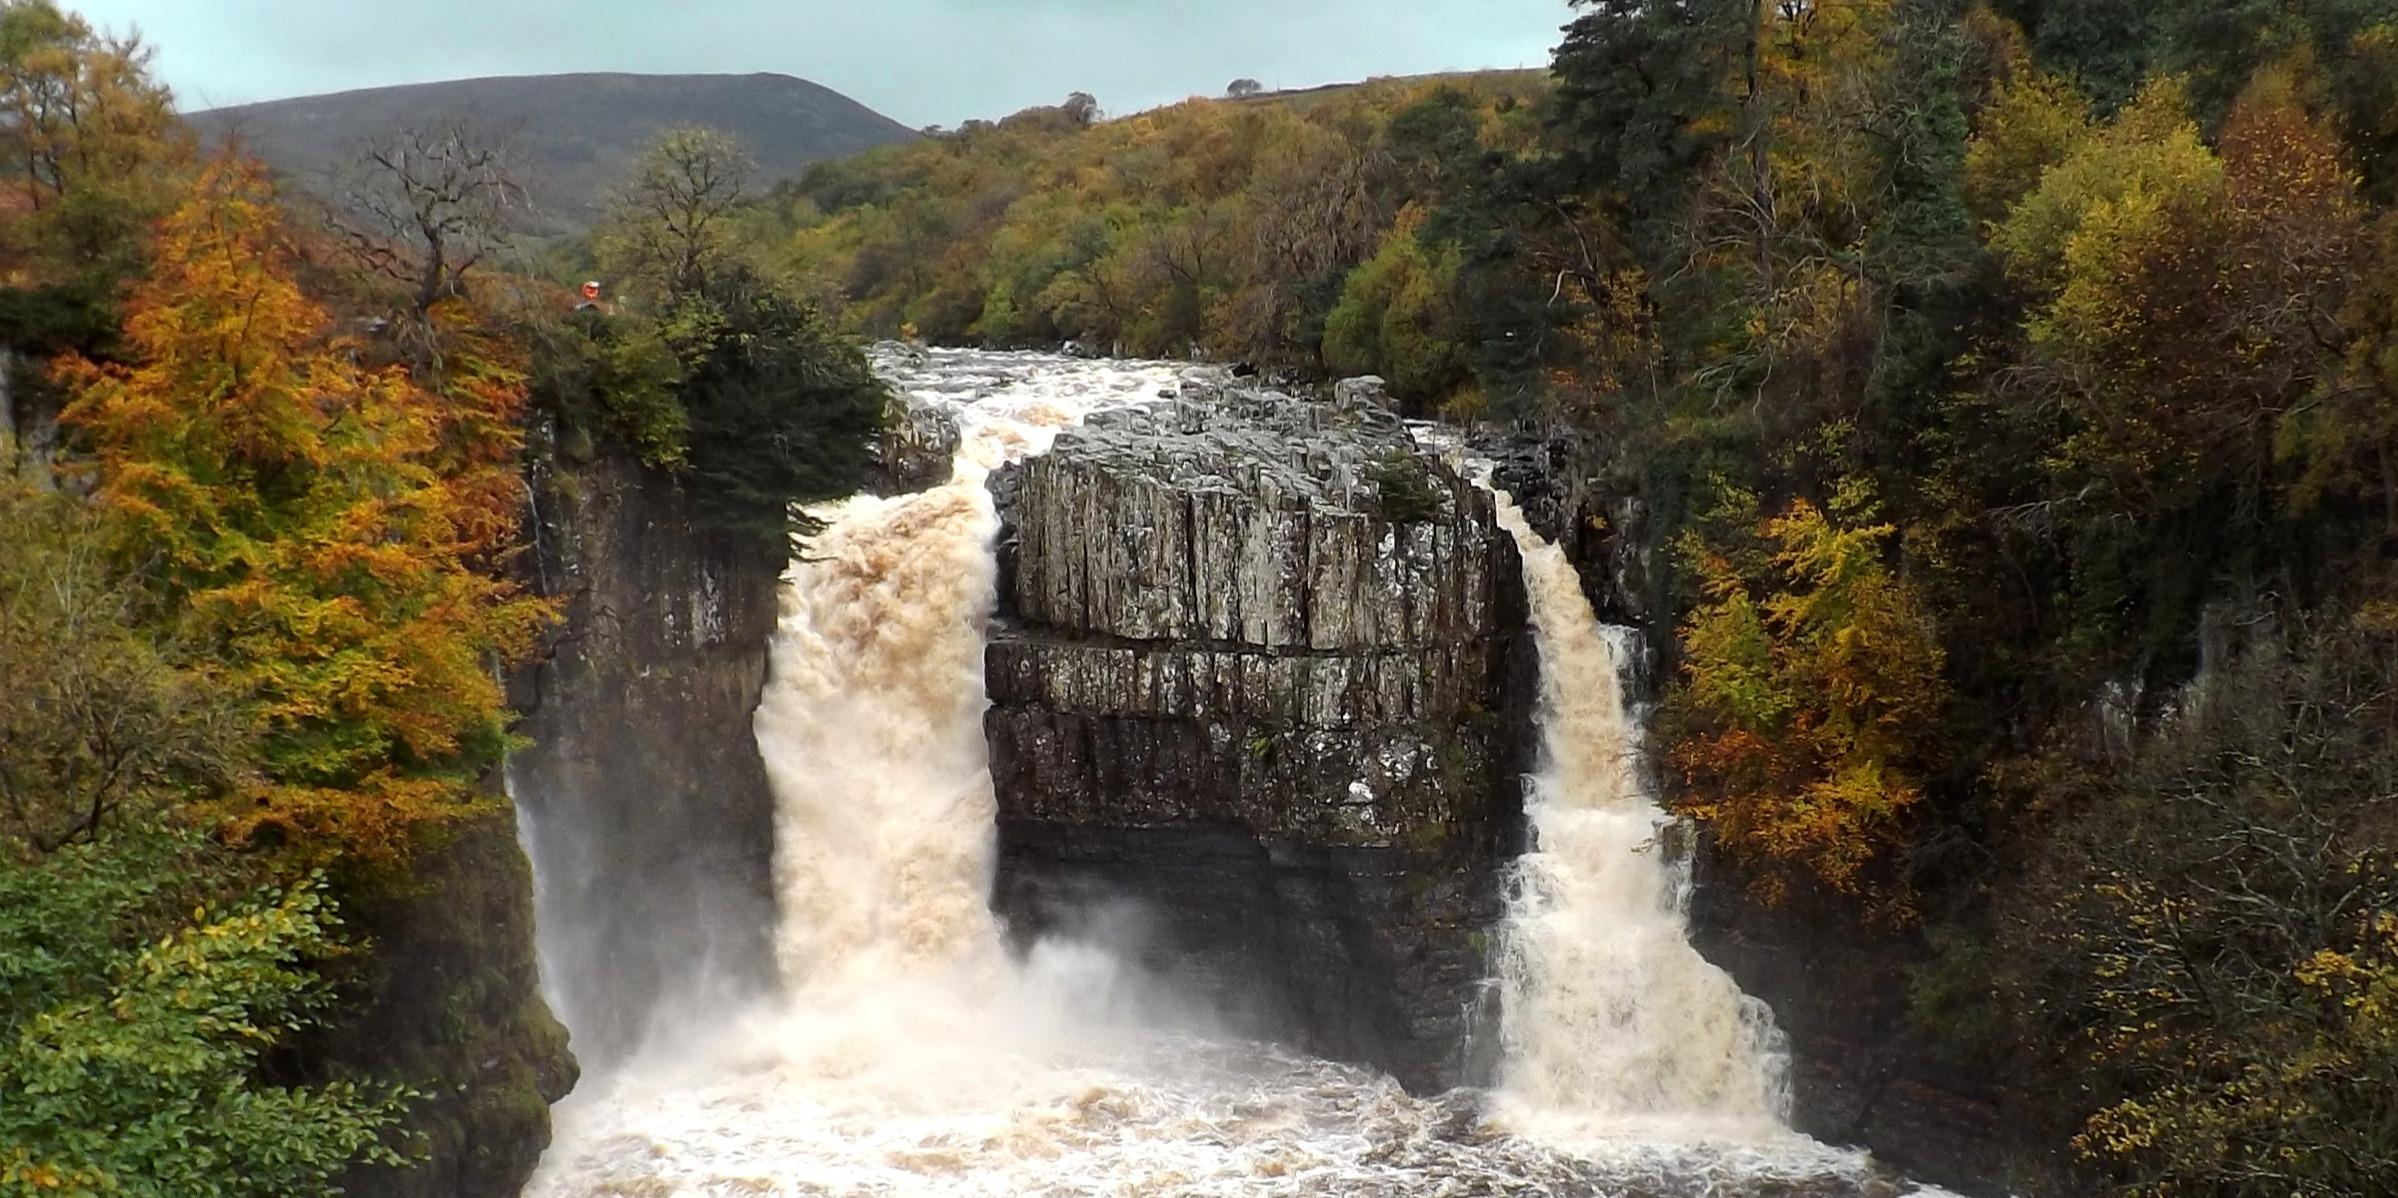 The Best Of Britain: Top 10 Waterfall Walks